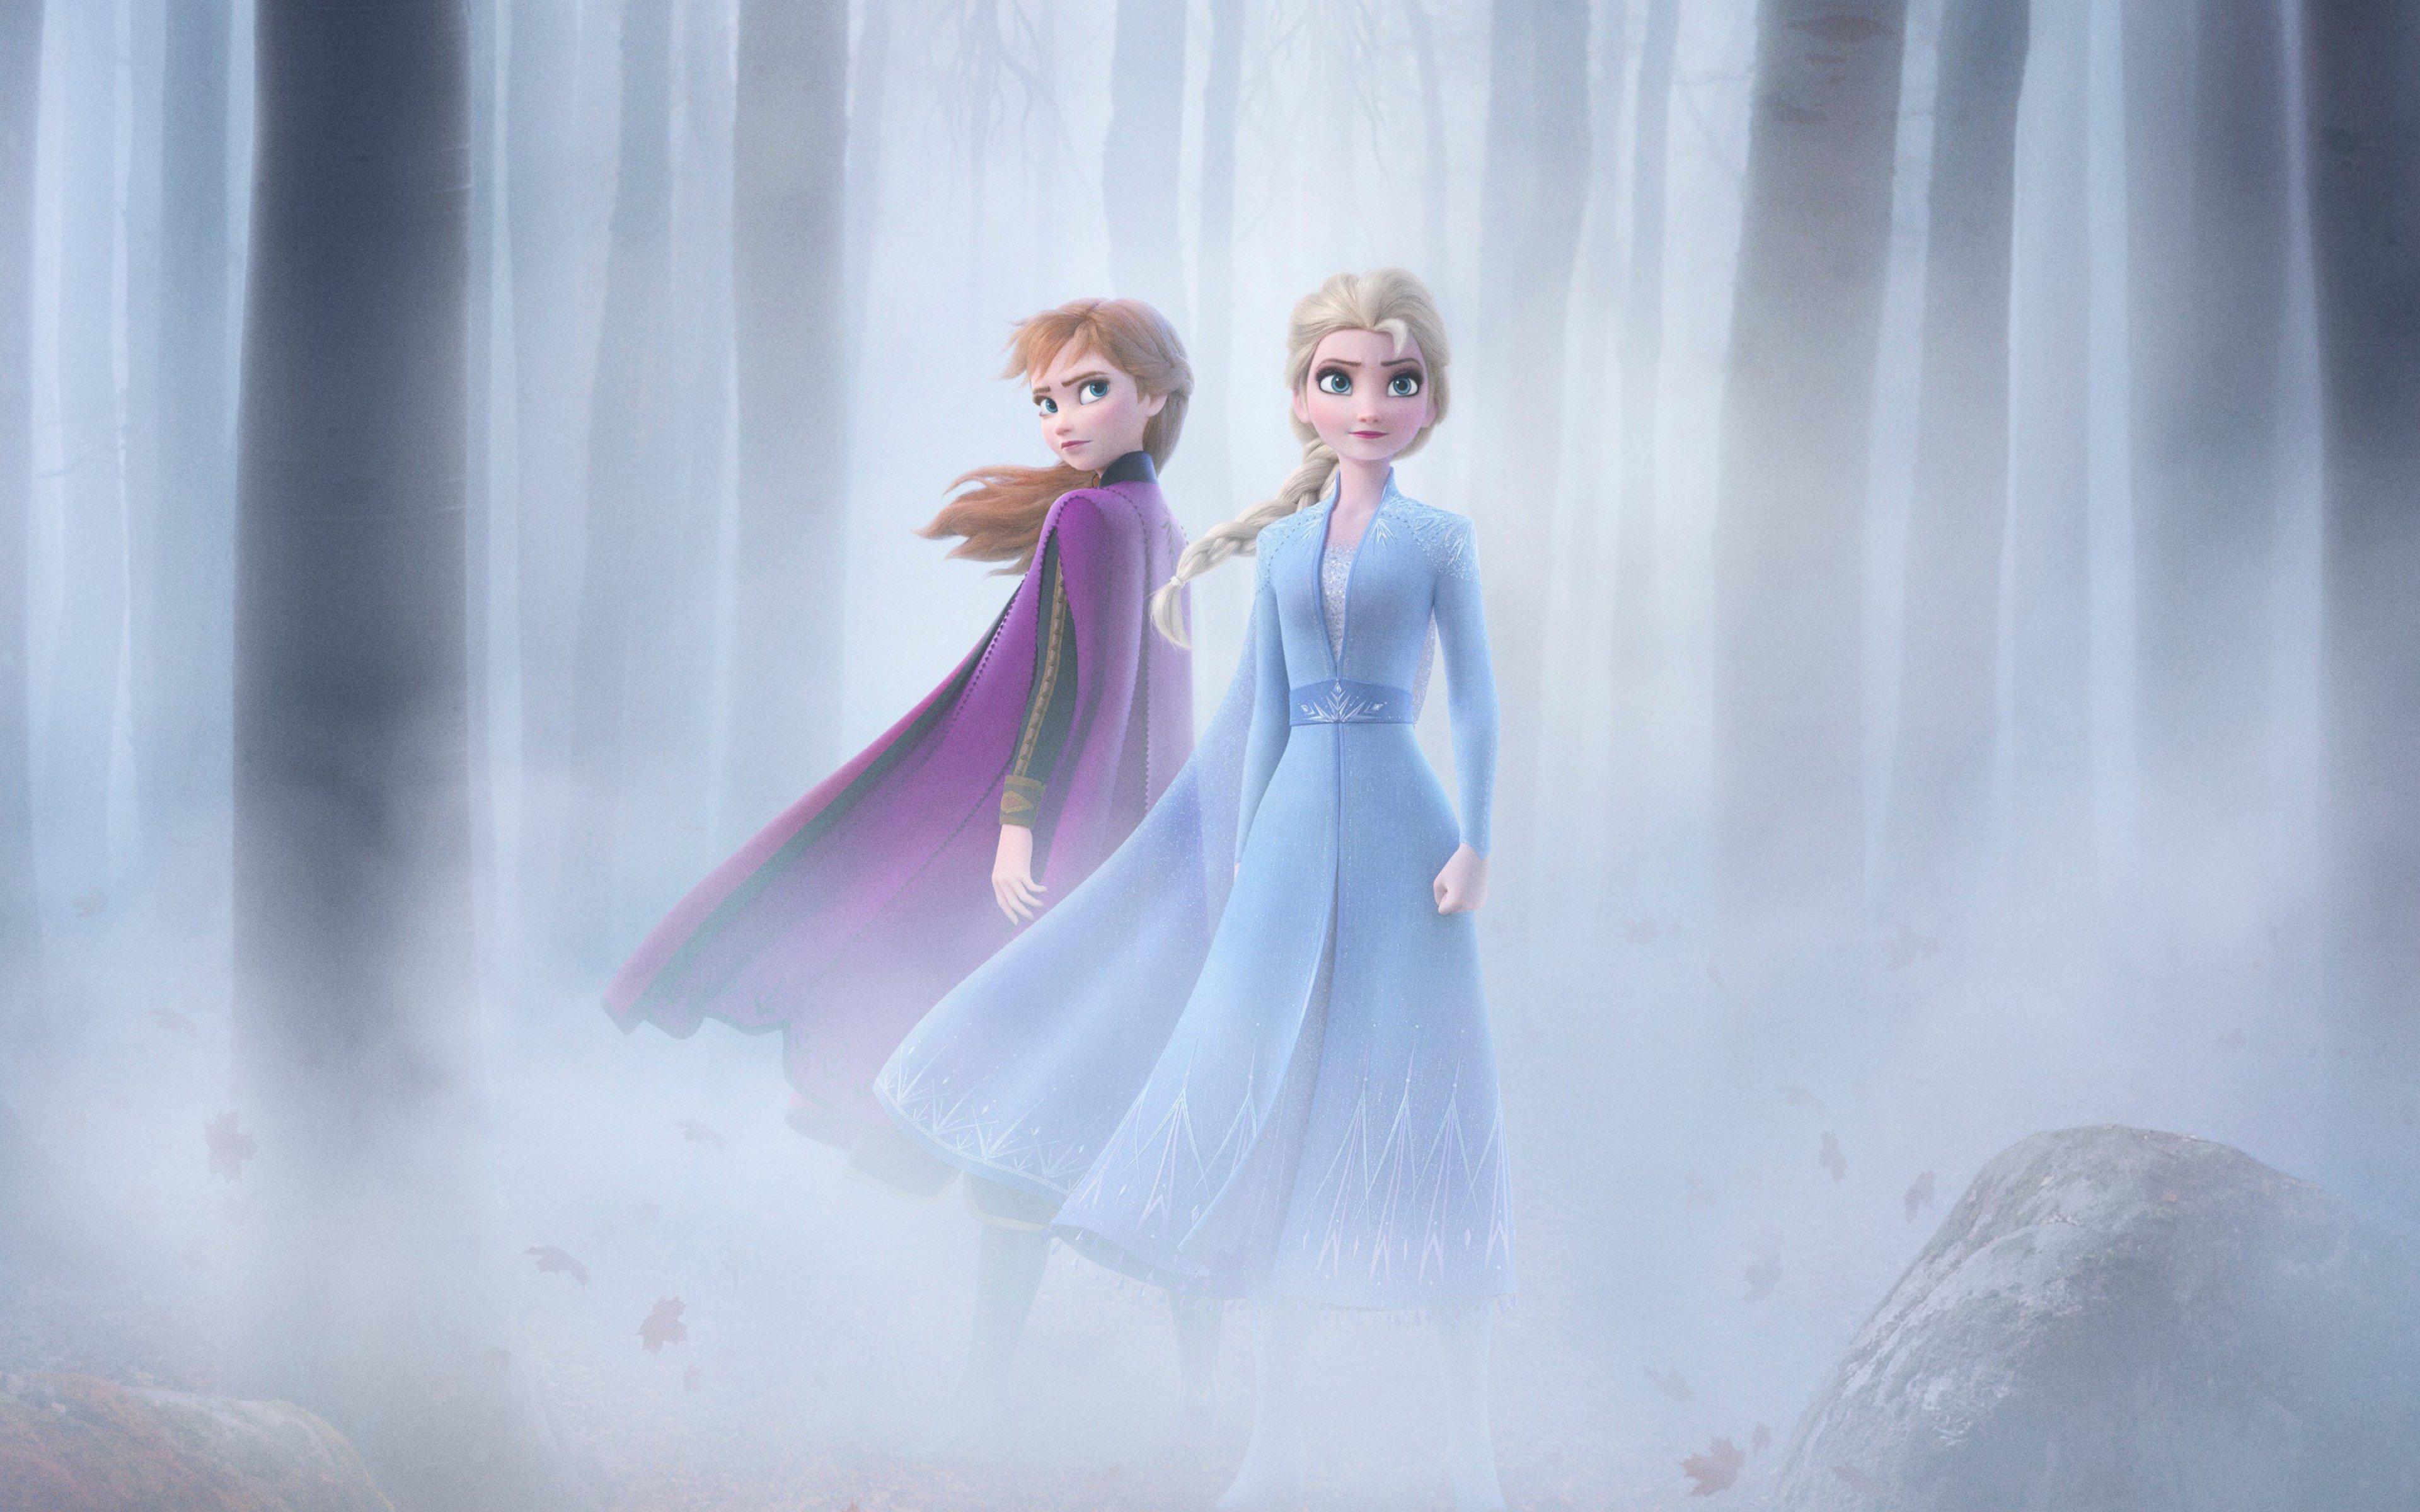 Wallpaper Anna and Elsa from Frozen 2